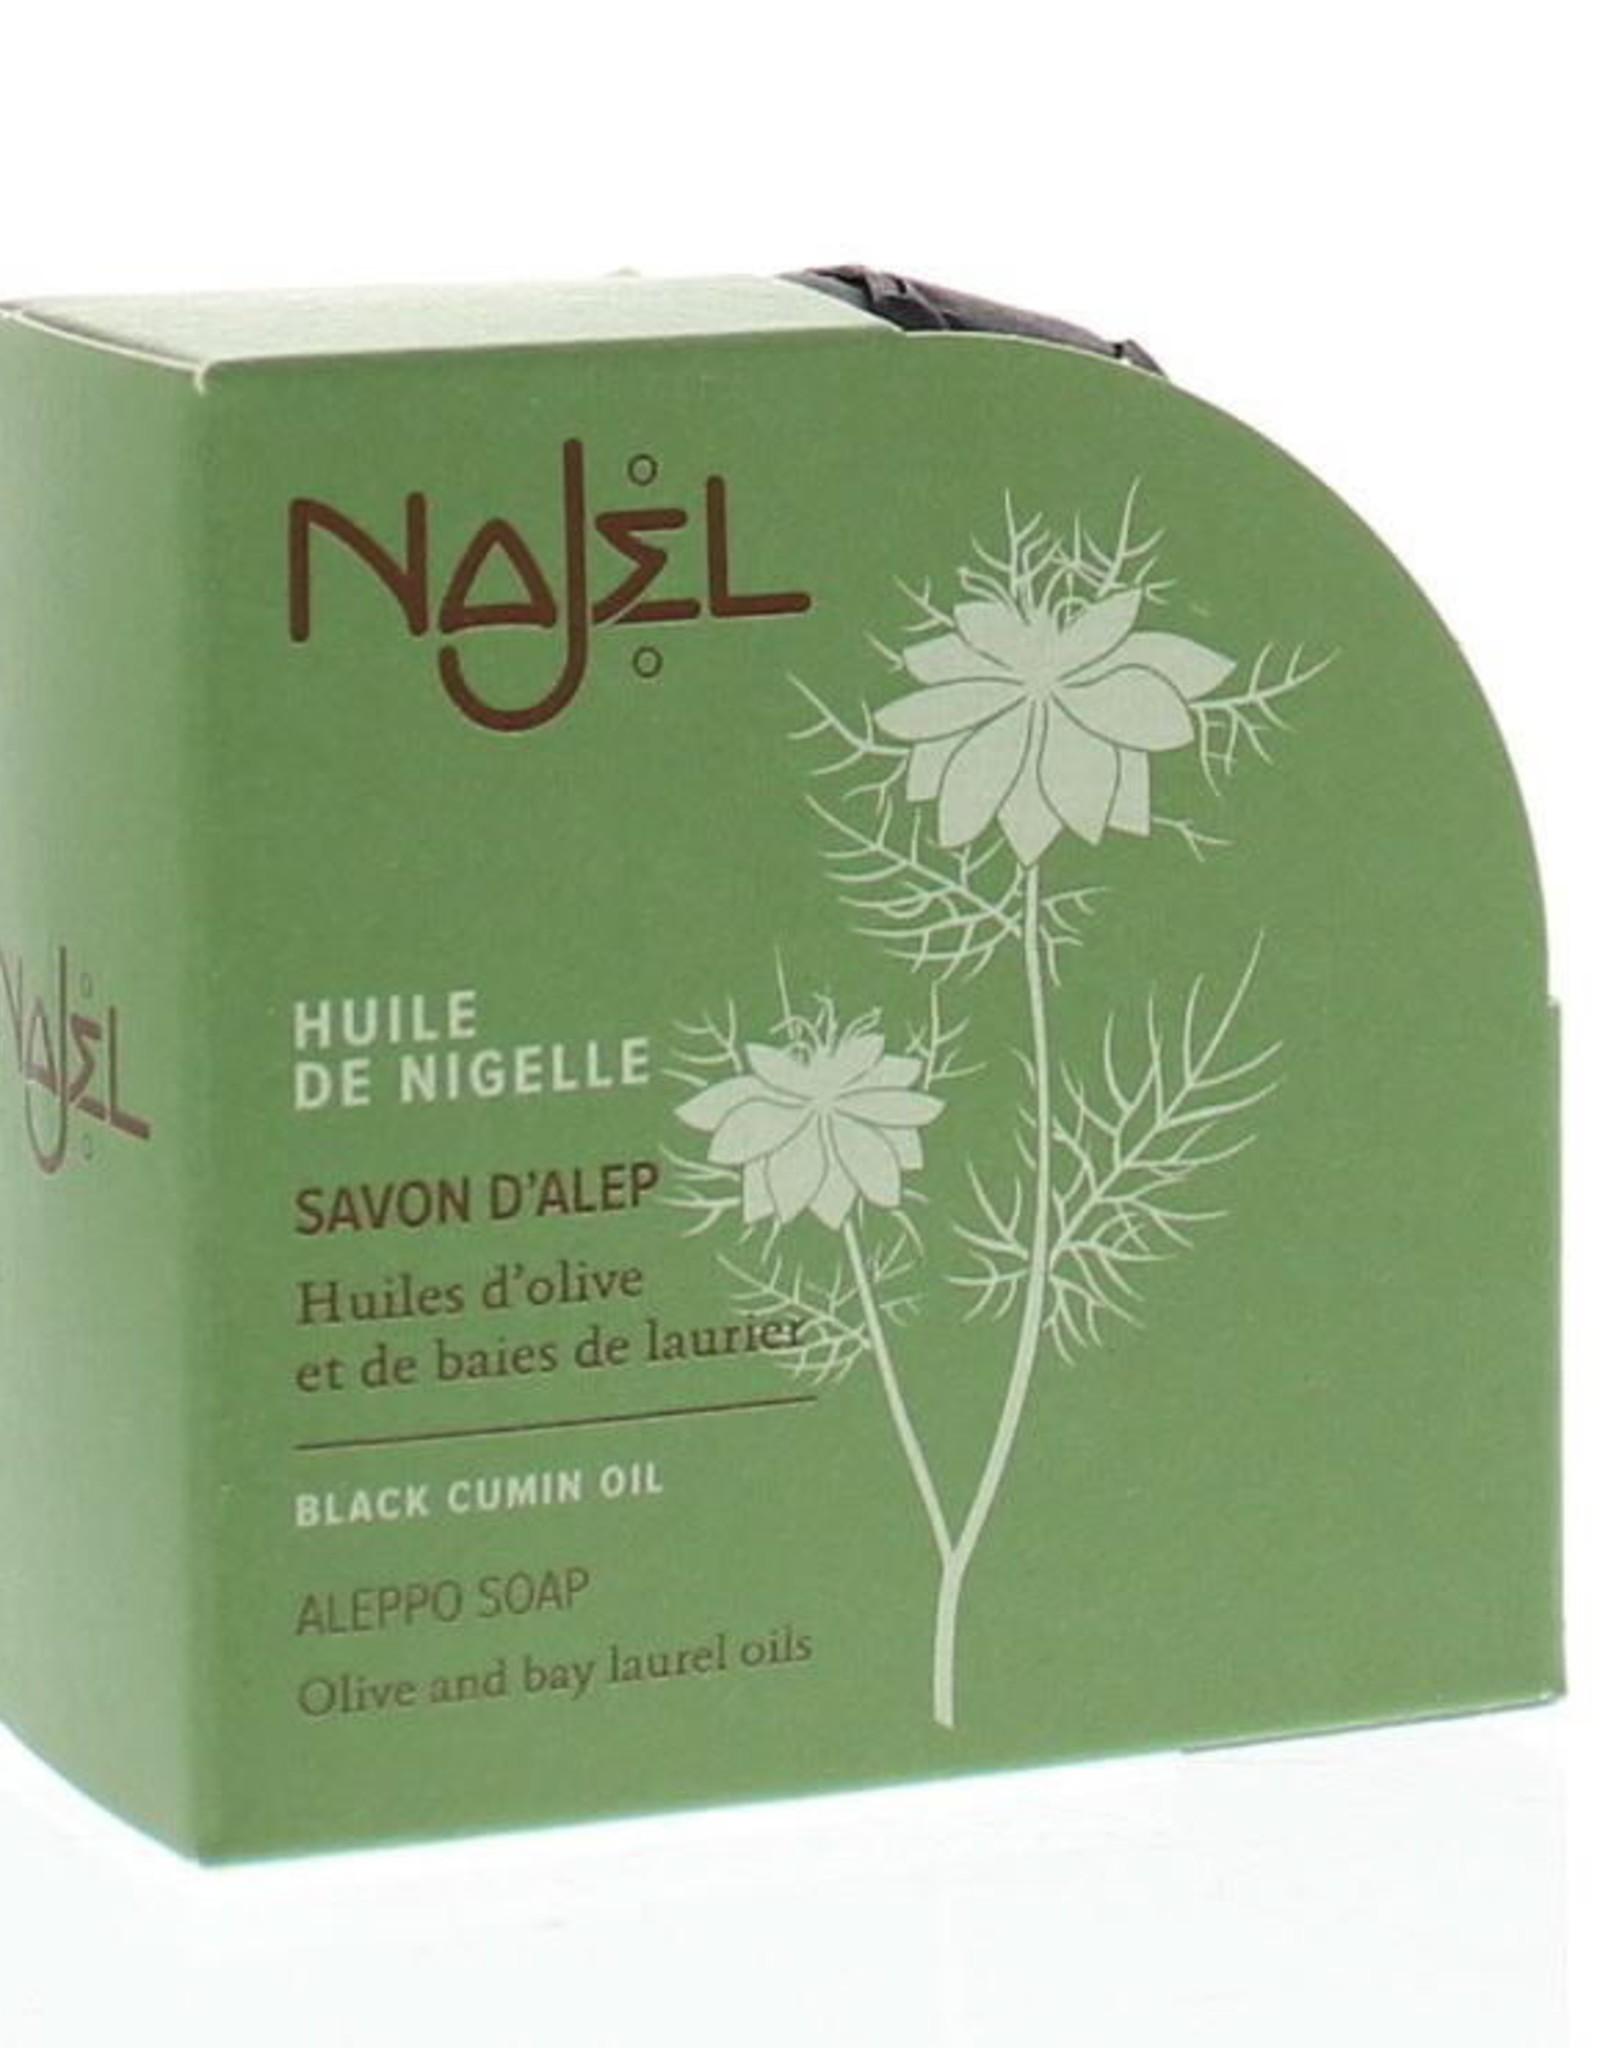 Najel Aleppo zeep nigella olie zwarte komijn 100 g